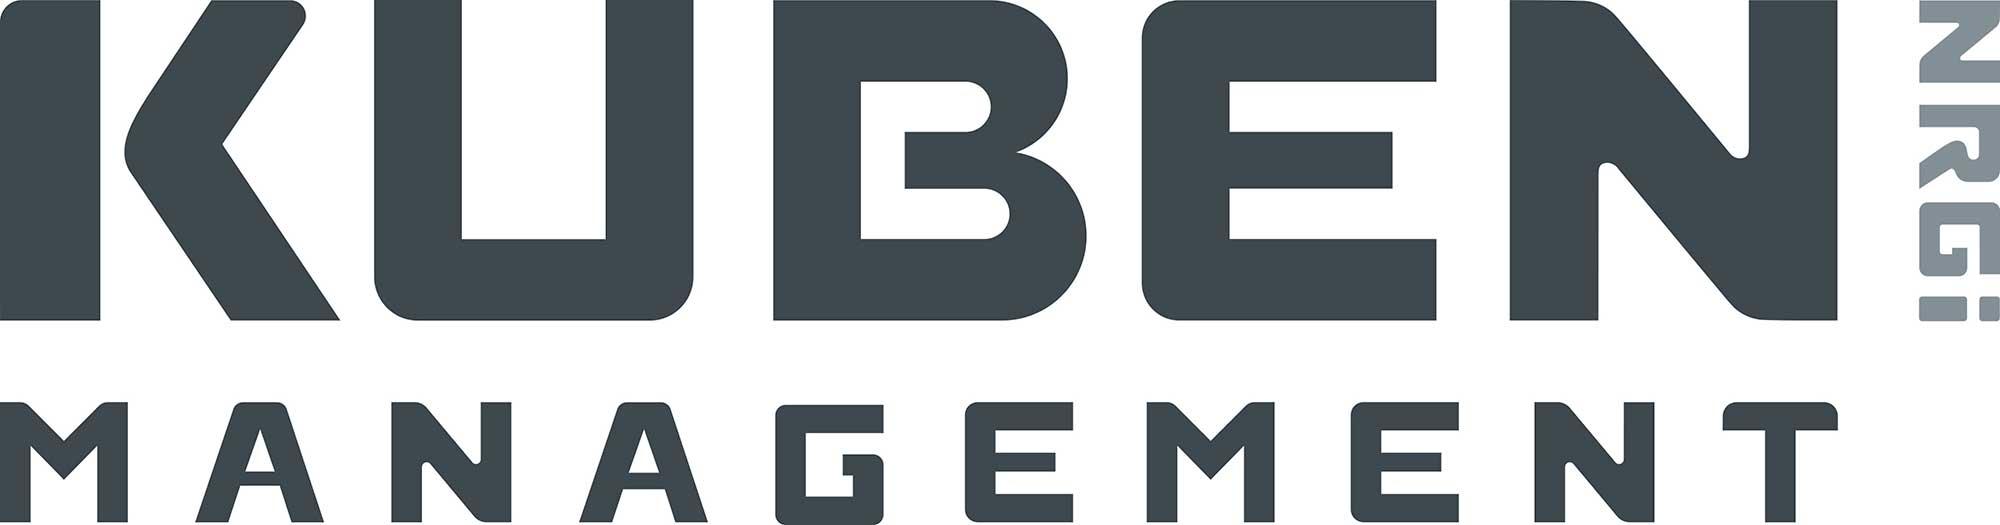 KUBEN-logo_cmyk